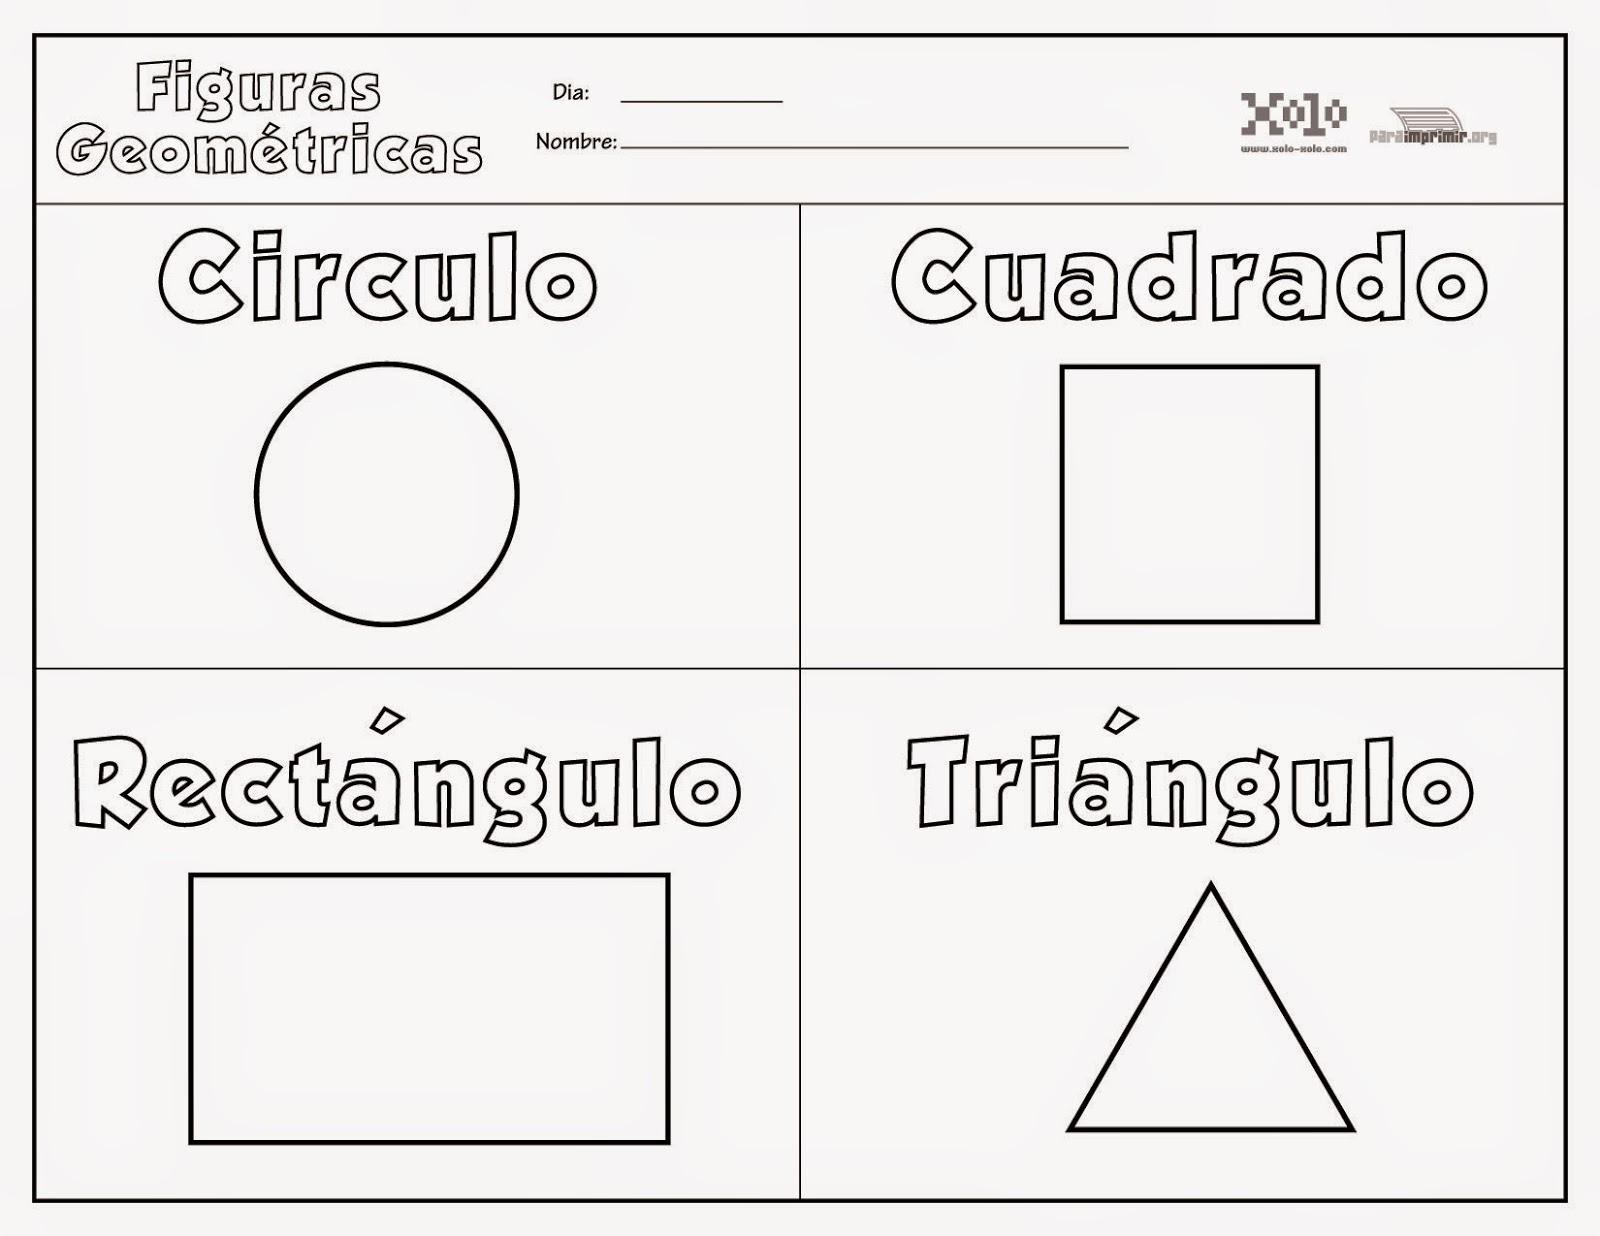 Dibujos De Figuras Geometricas Para Colorear E Imprimir: Educación Infantil Con TIC: Figuras Geométricas